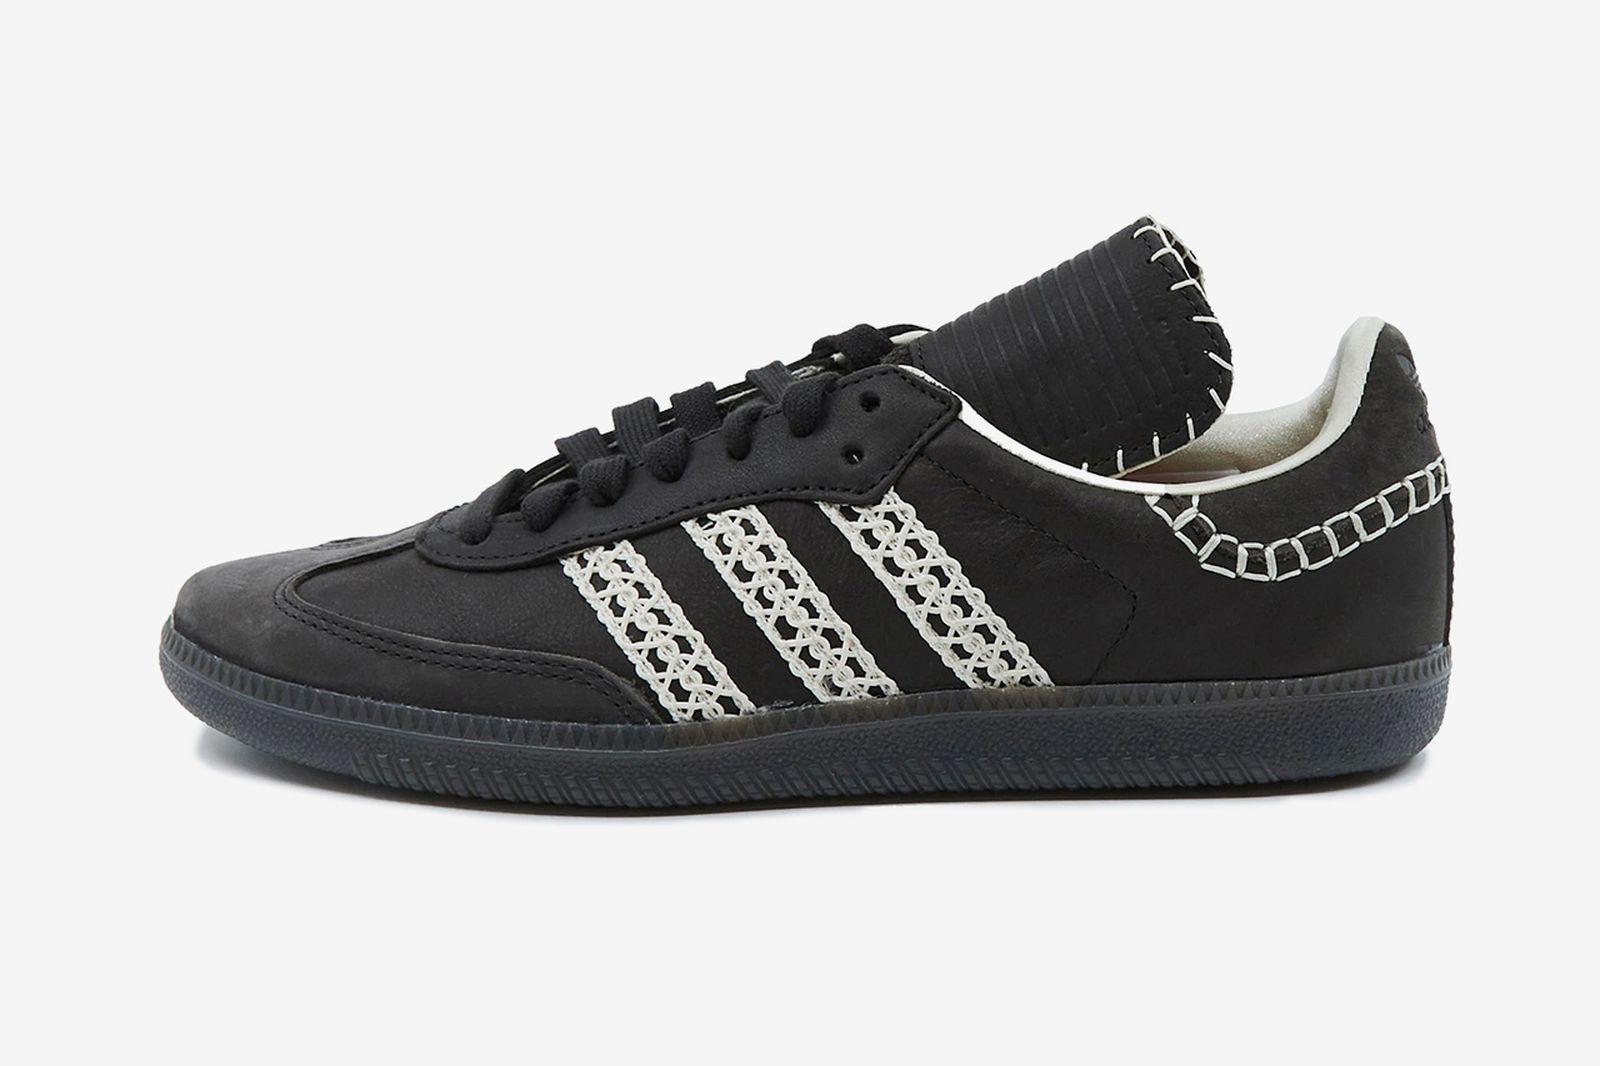 wales-bonner-adidas-originals-samba-release-date-price-05